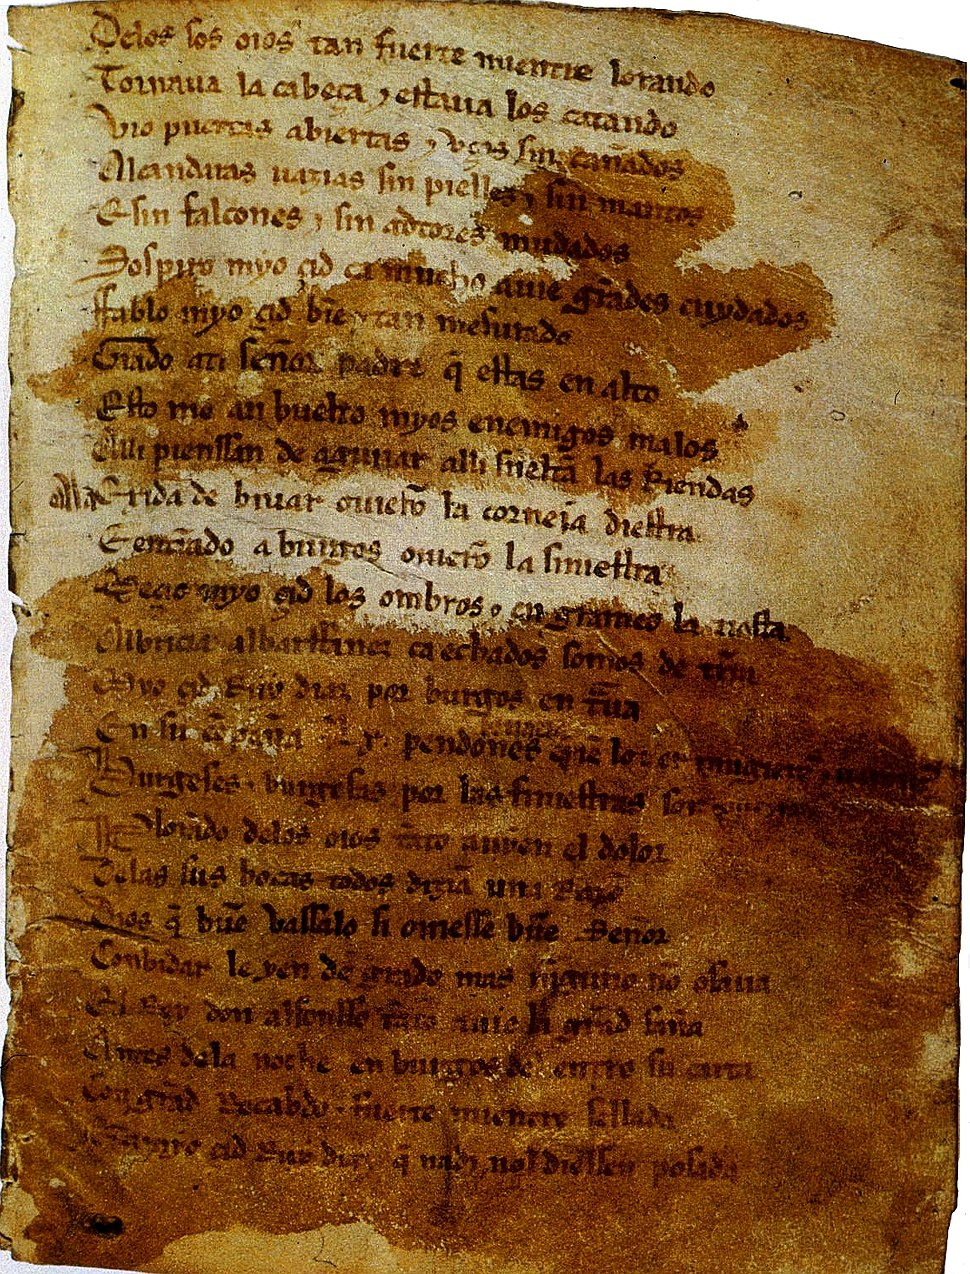 Cantar de mio Cid f. 1r (rep)